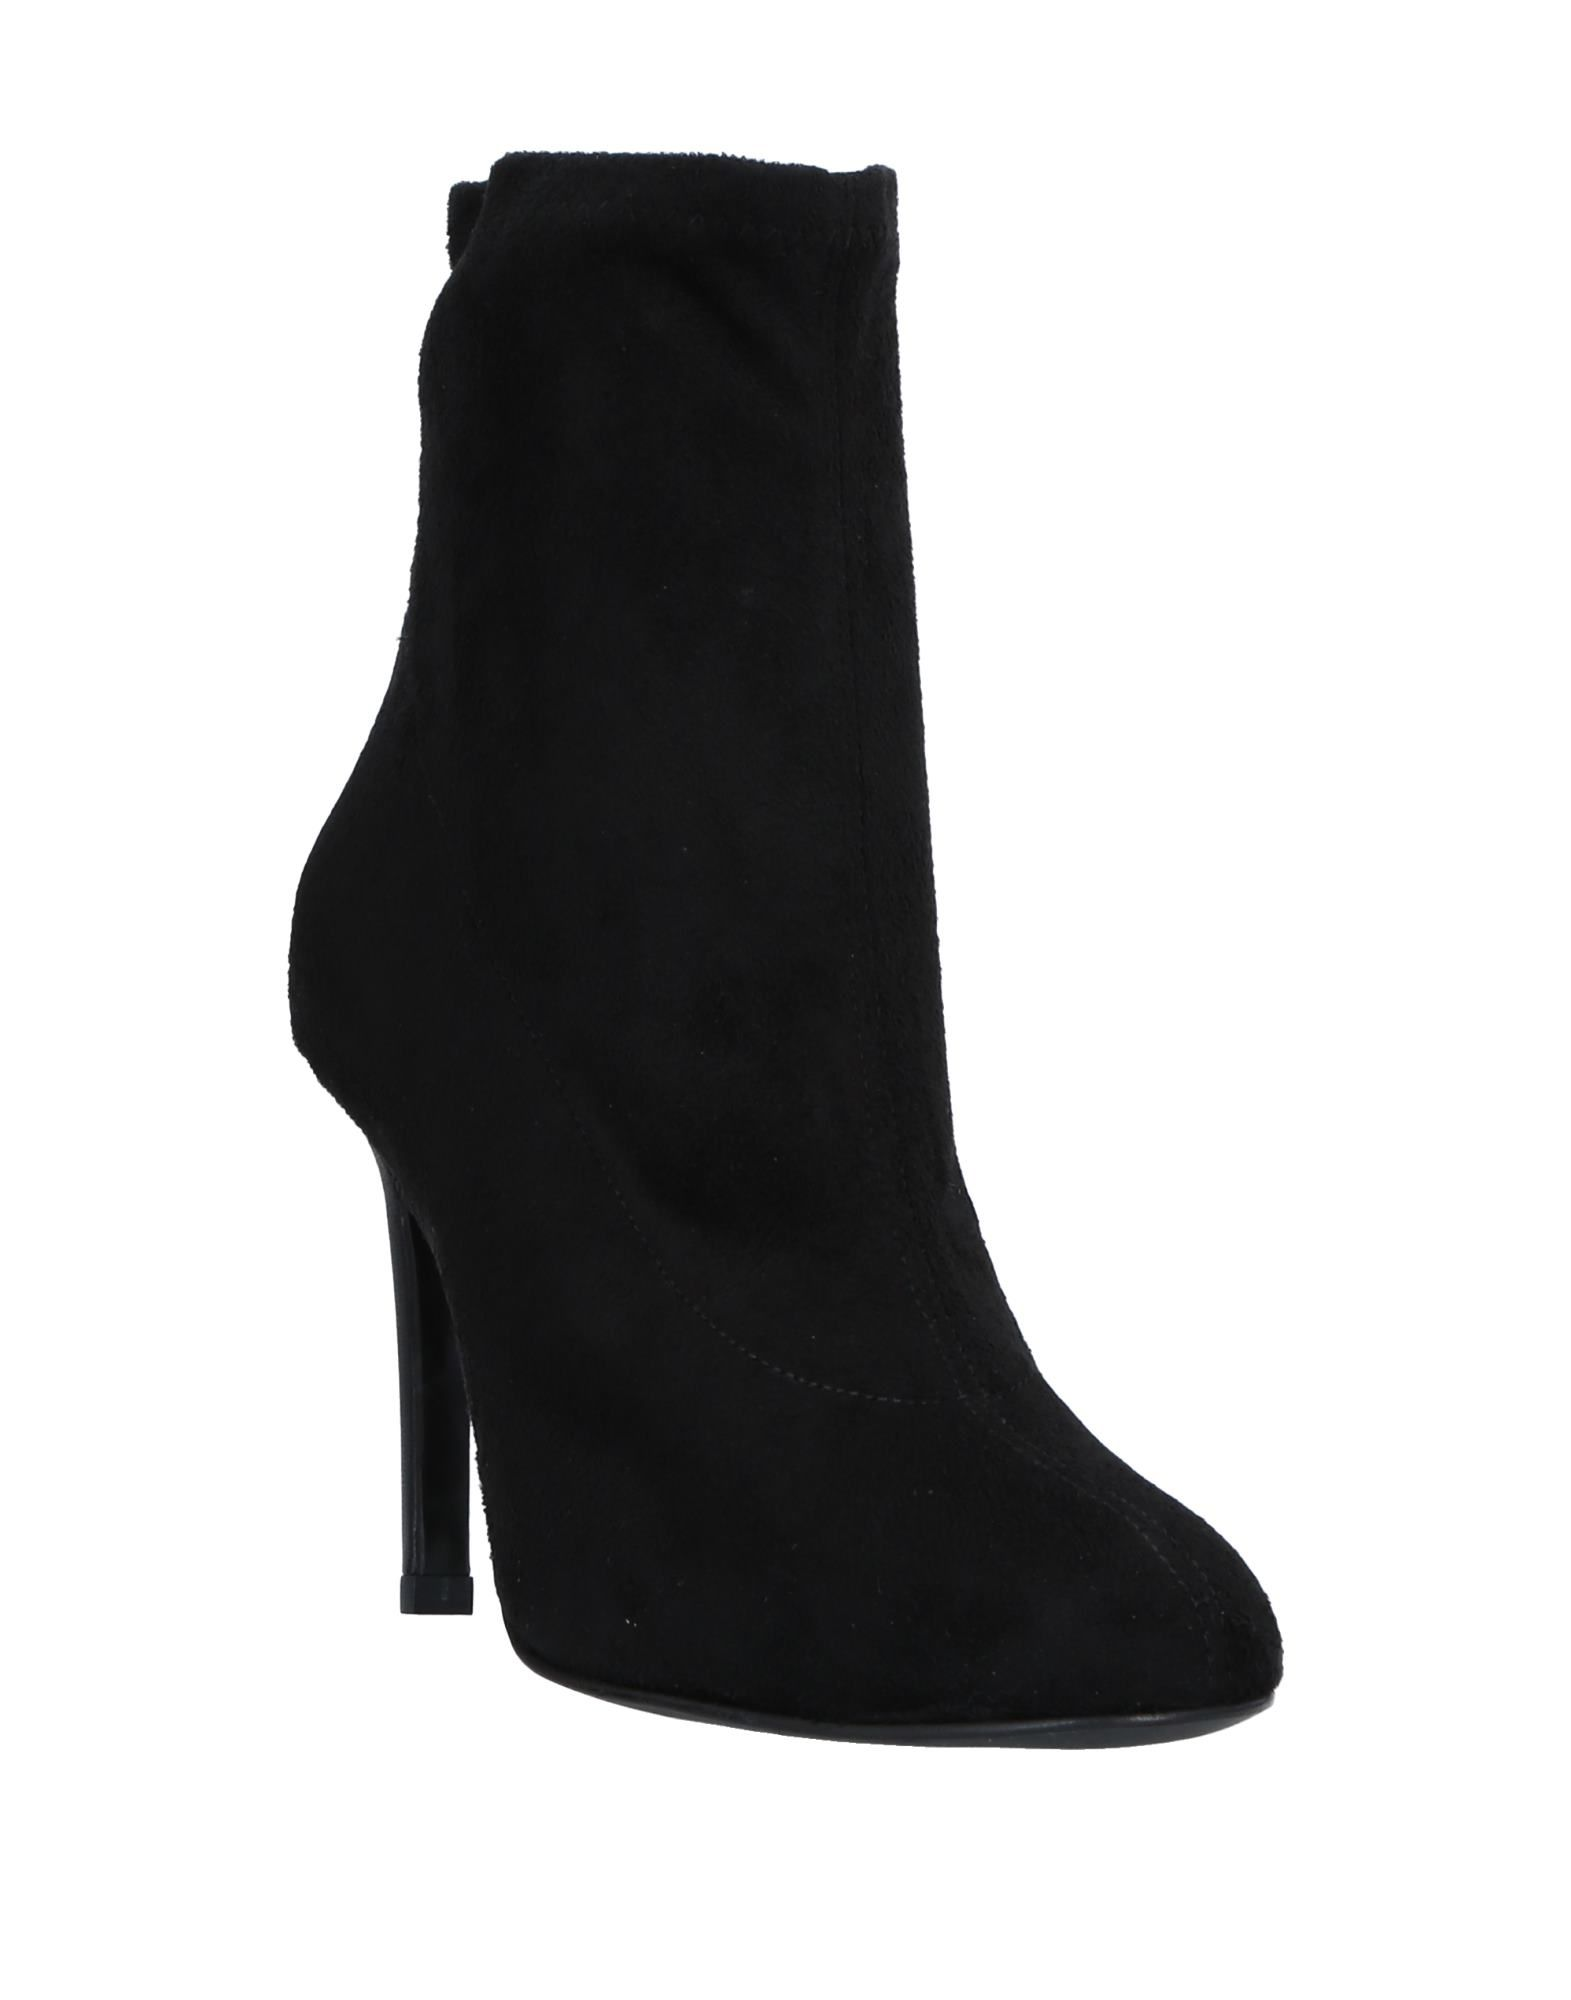 Gianni Marra 11543310AAGut Stiefelette Damen  11543310AAGut Marra aussehende strapazierfähige Schuhe 280c73